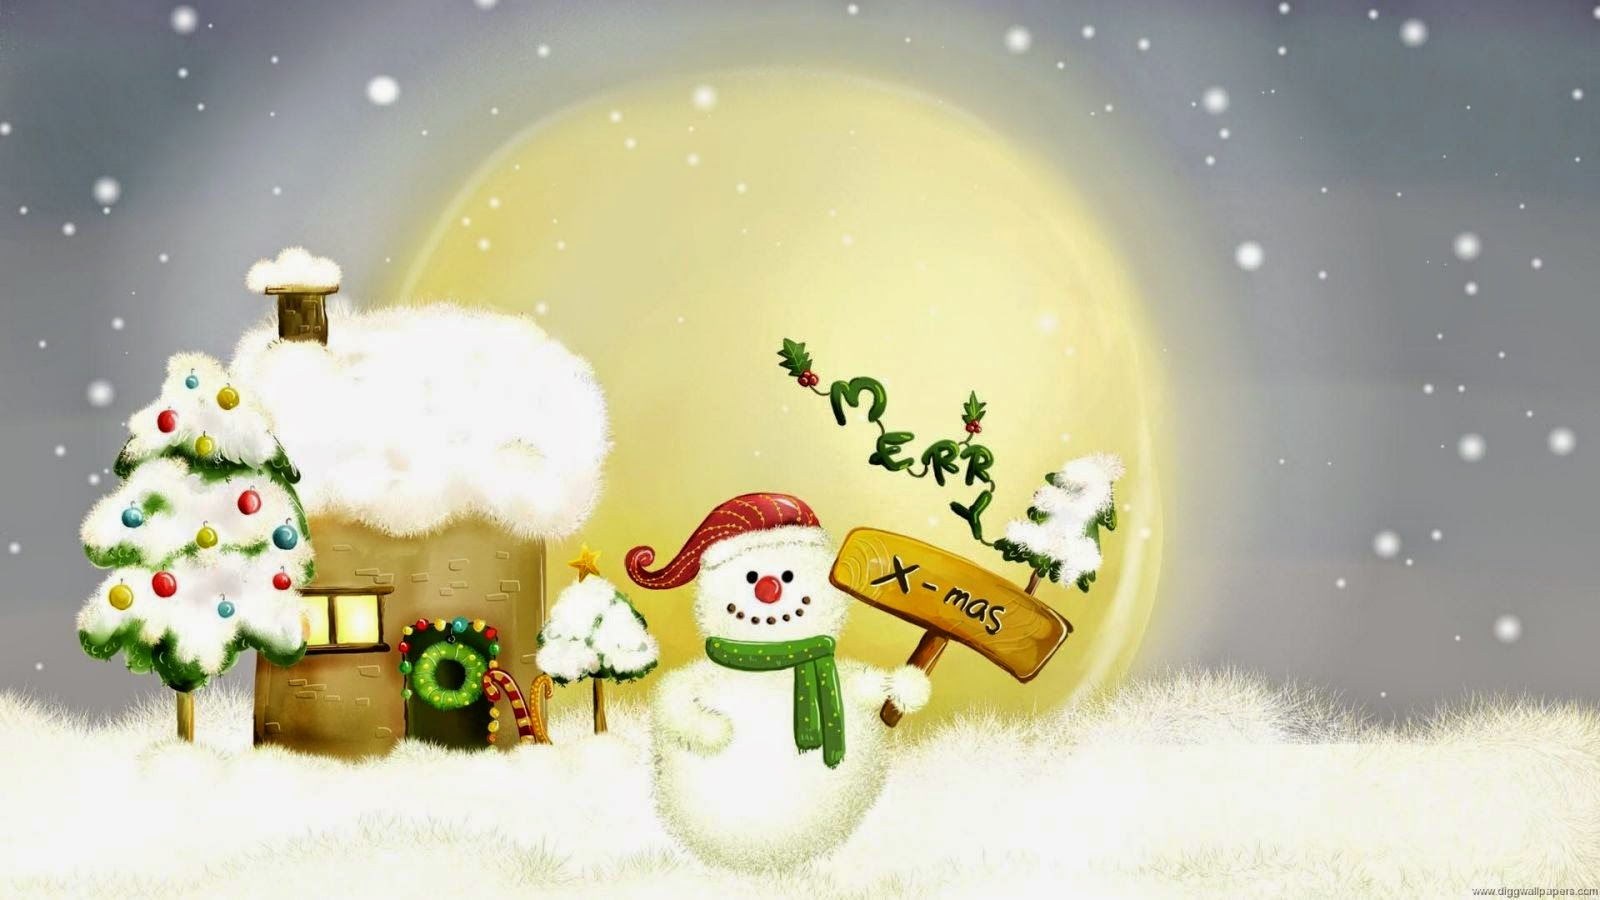 Merry-xmas-snowman-Christmas-cartoon-drawing-image-for-kids-photo.jpg